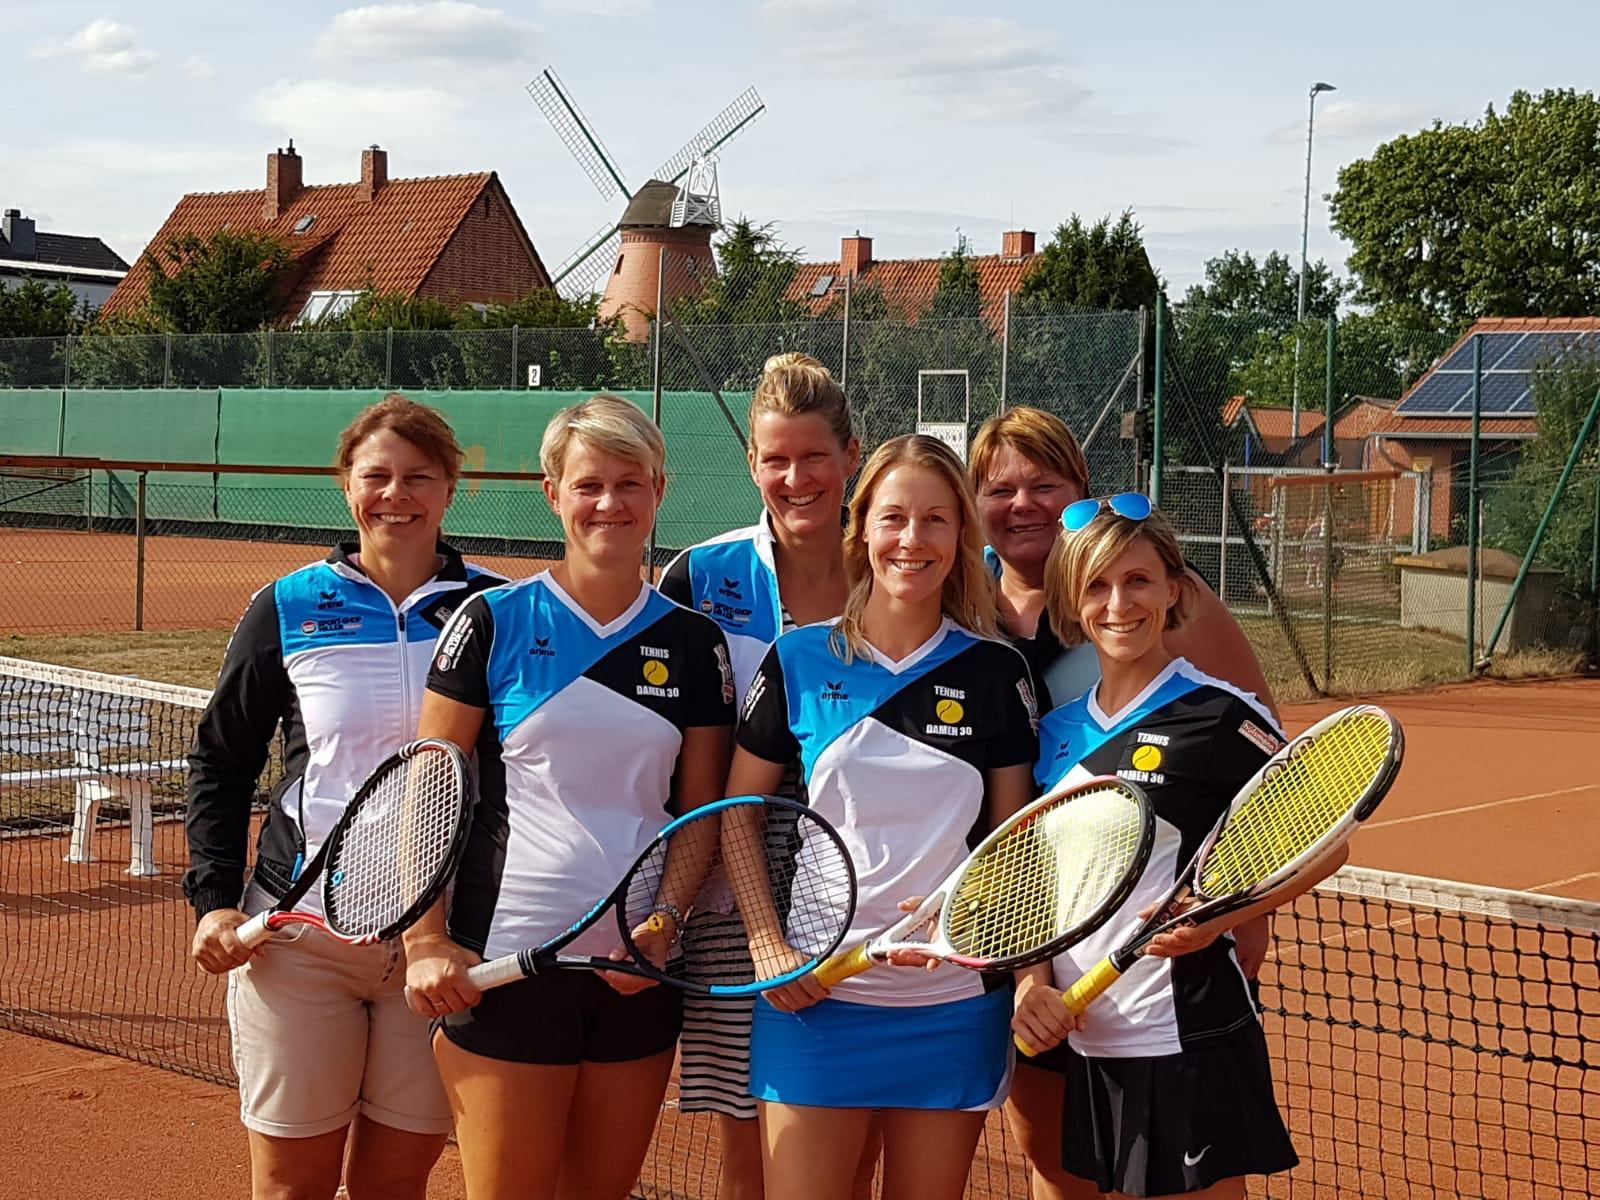 Von Links: Alexandra Gerke, Tina Krohn, Christina Rosenberger, Tina Fricke, Sandra Hülsmann, Oksana Dallmer.